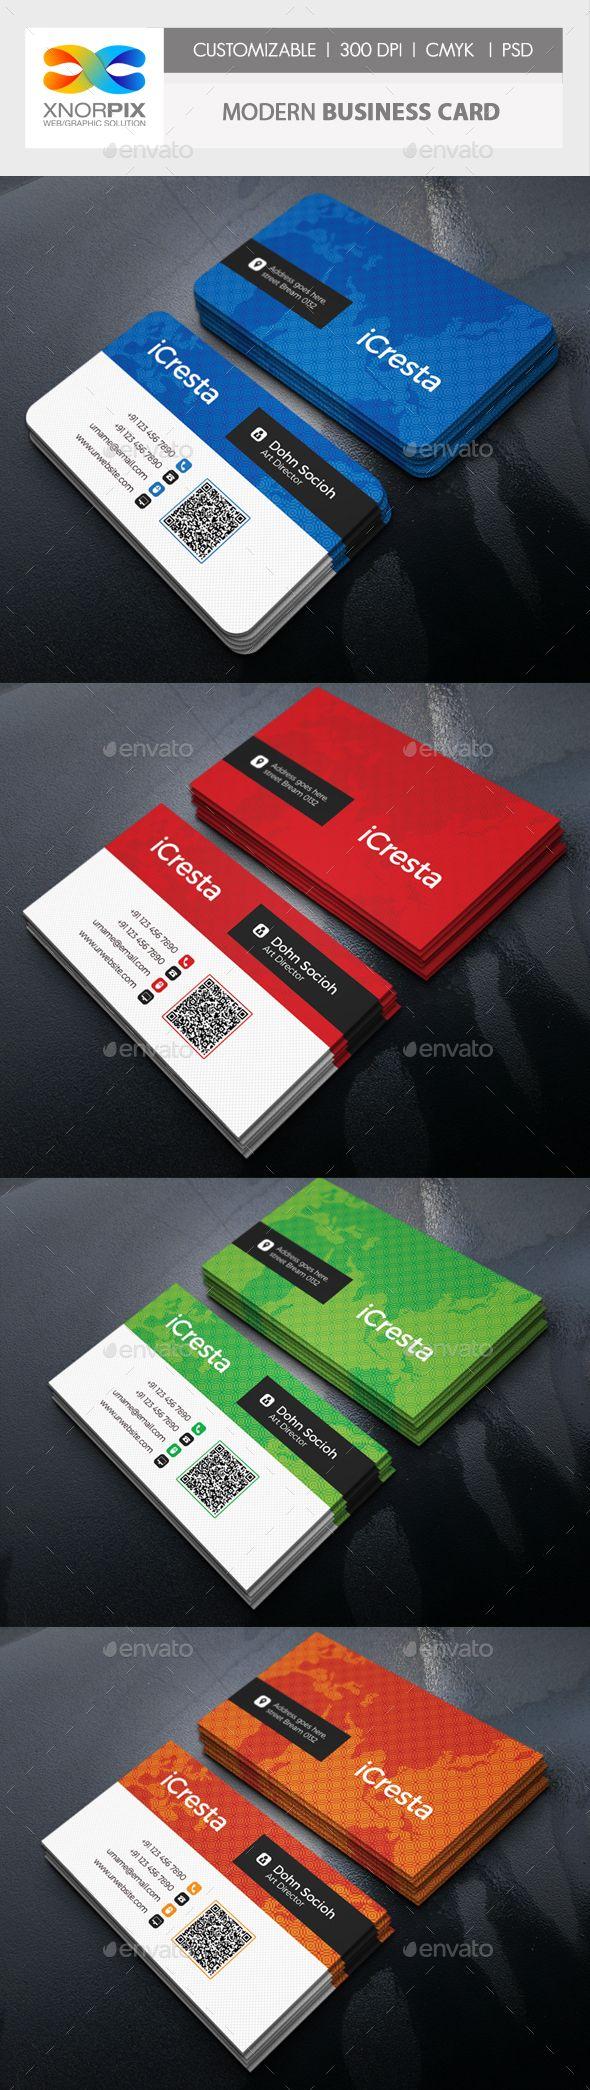 Modern Business Card Modern Business Cards Business Card Photoshop Business Card Template Design